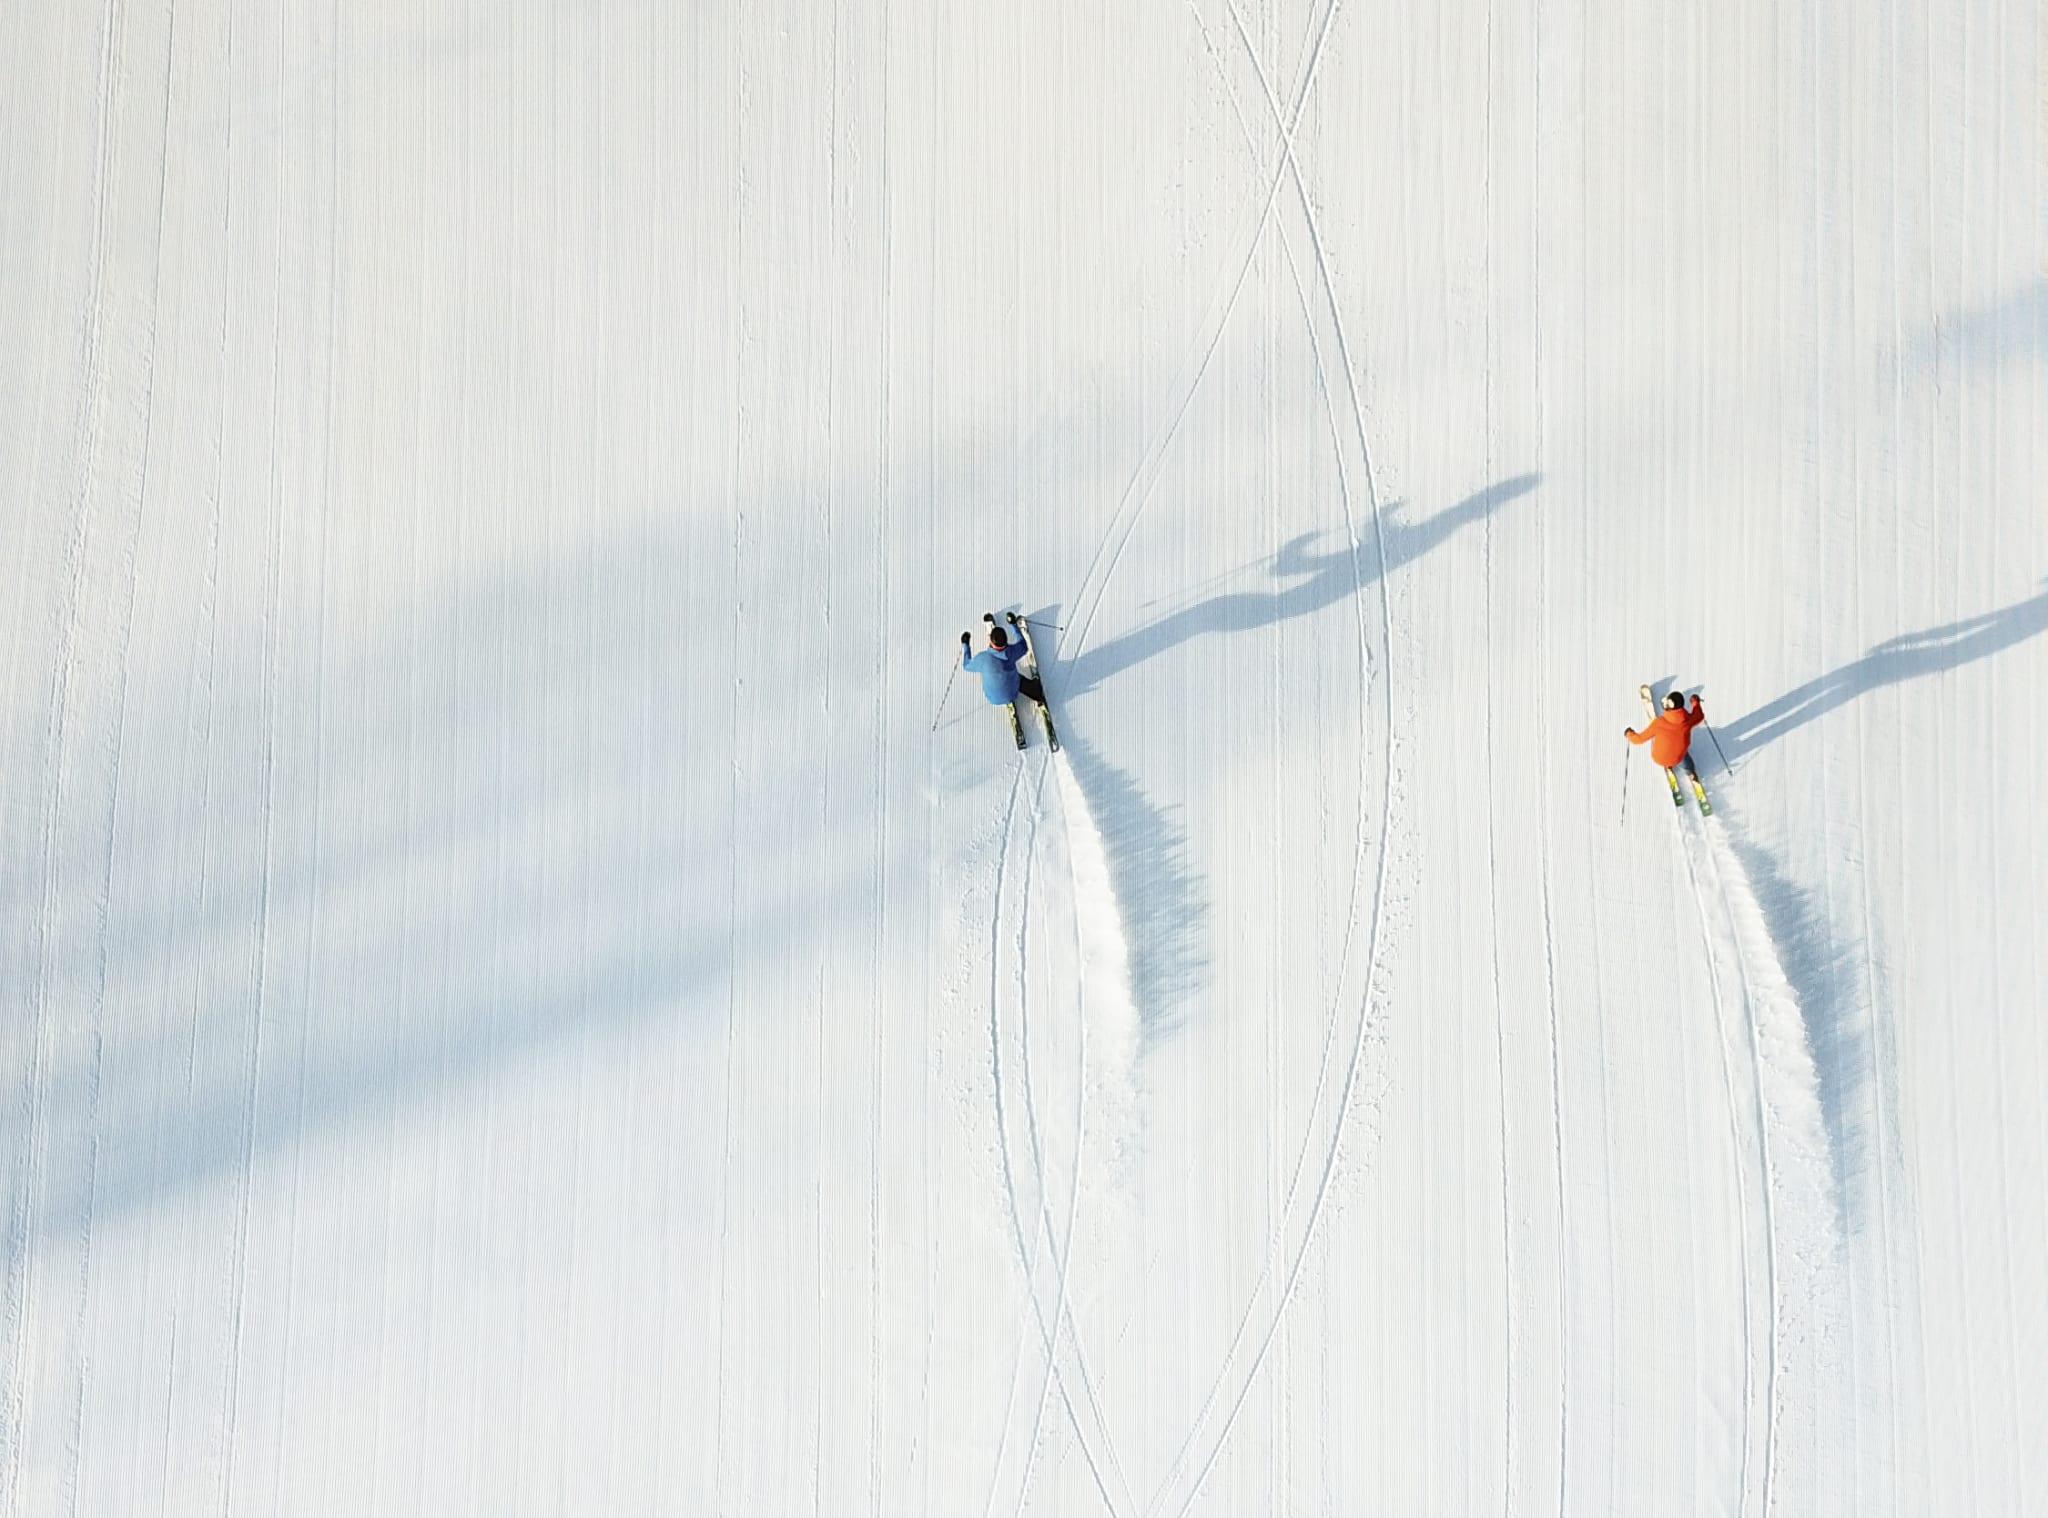 Opplev Alpin